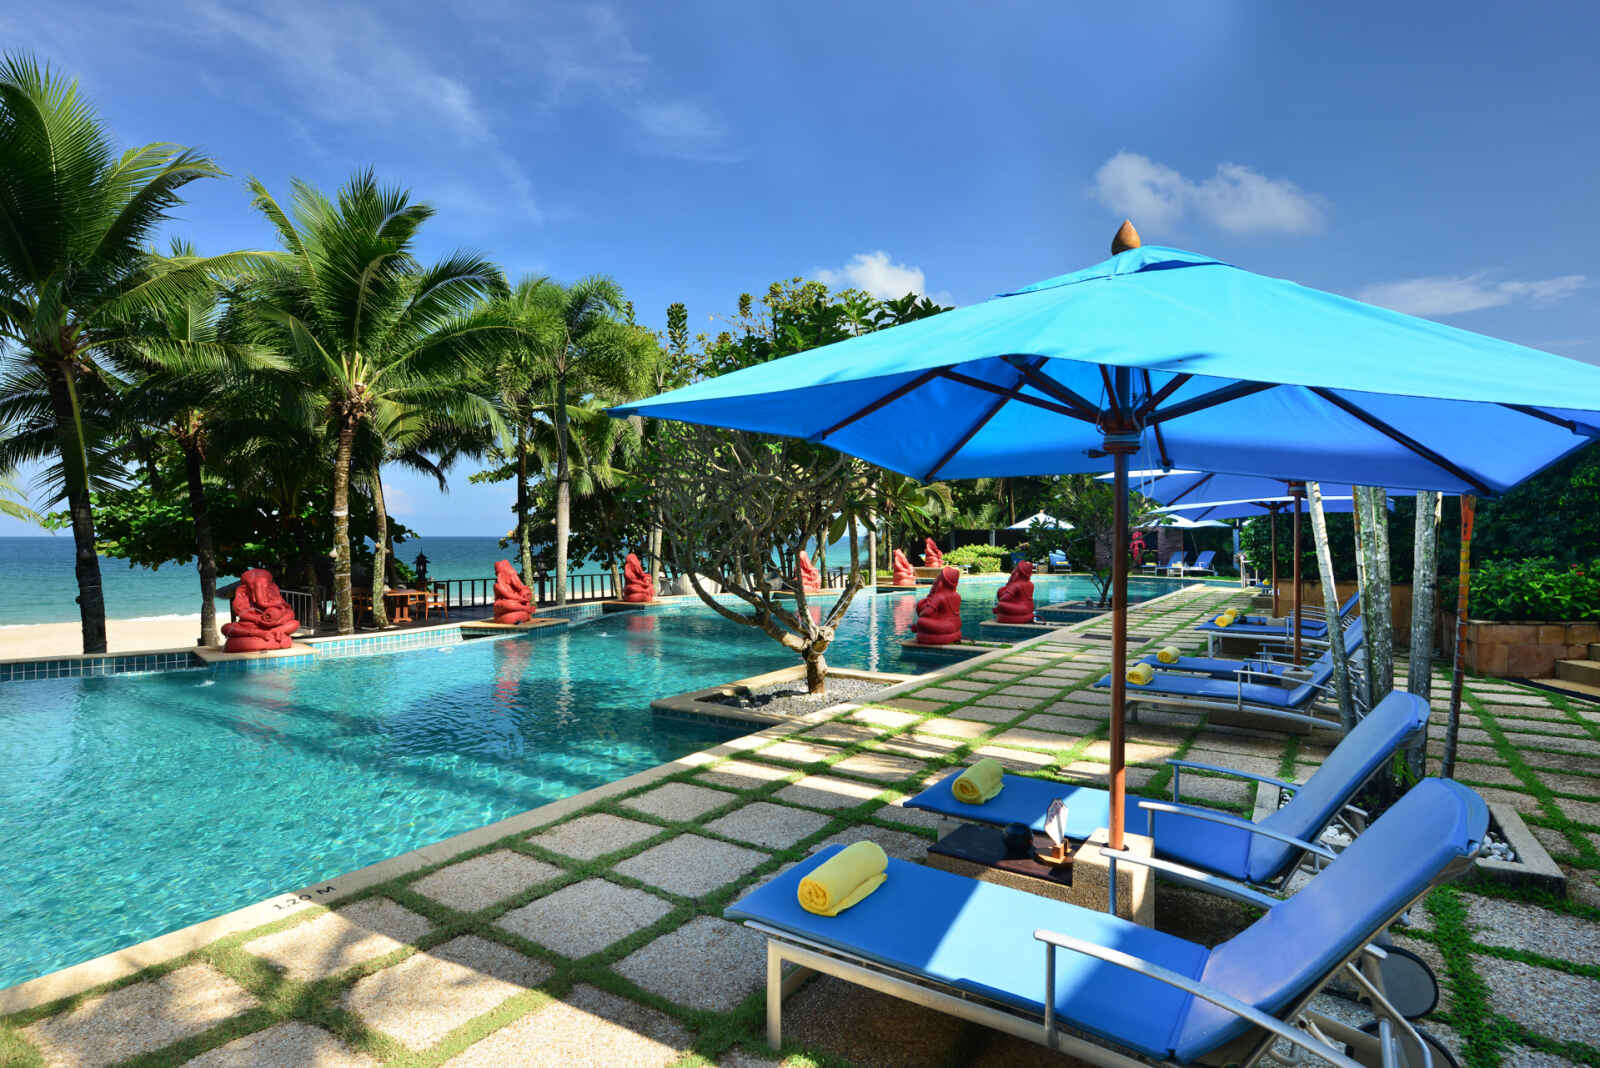 Thaïlande - Phuket - Hôtel Andaman White Beach Resort 4*